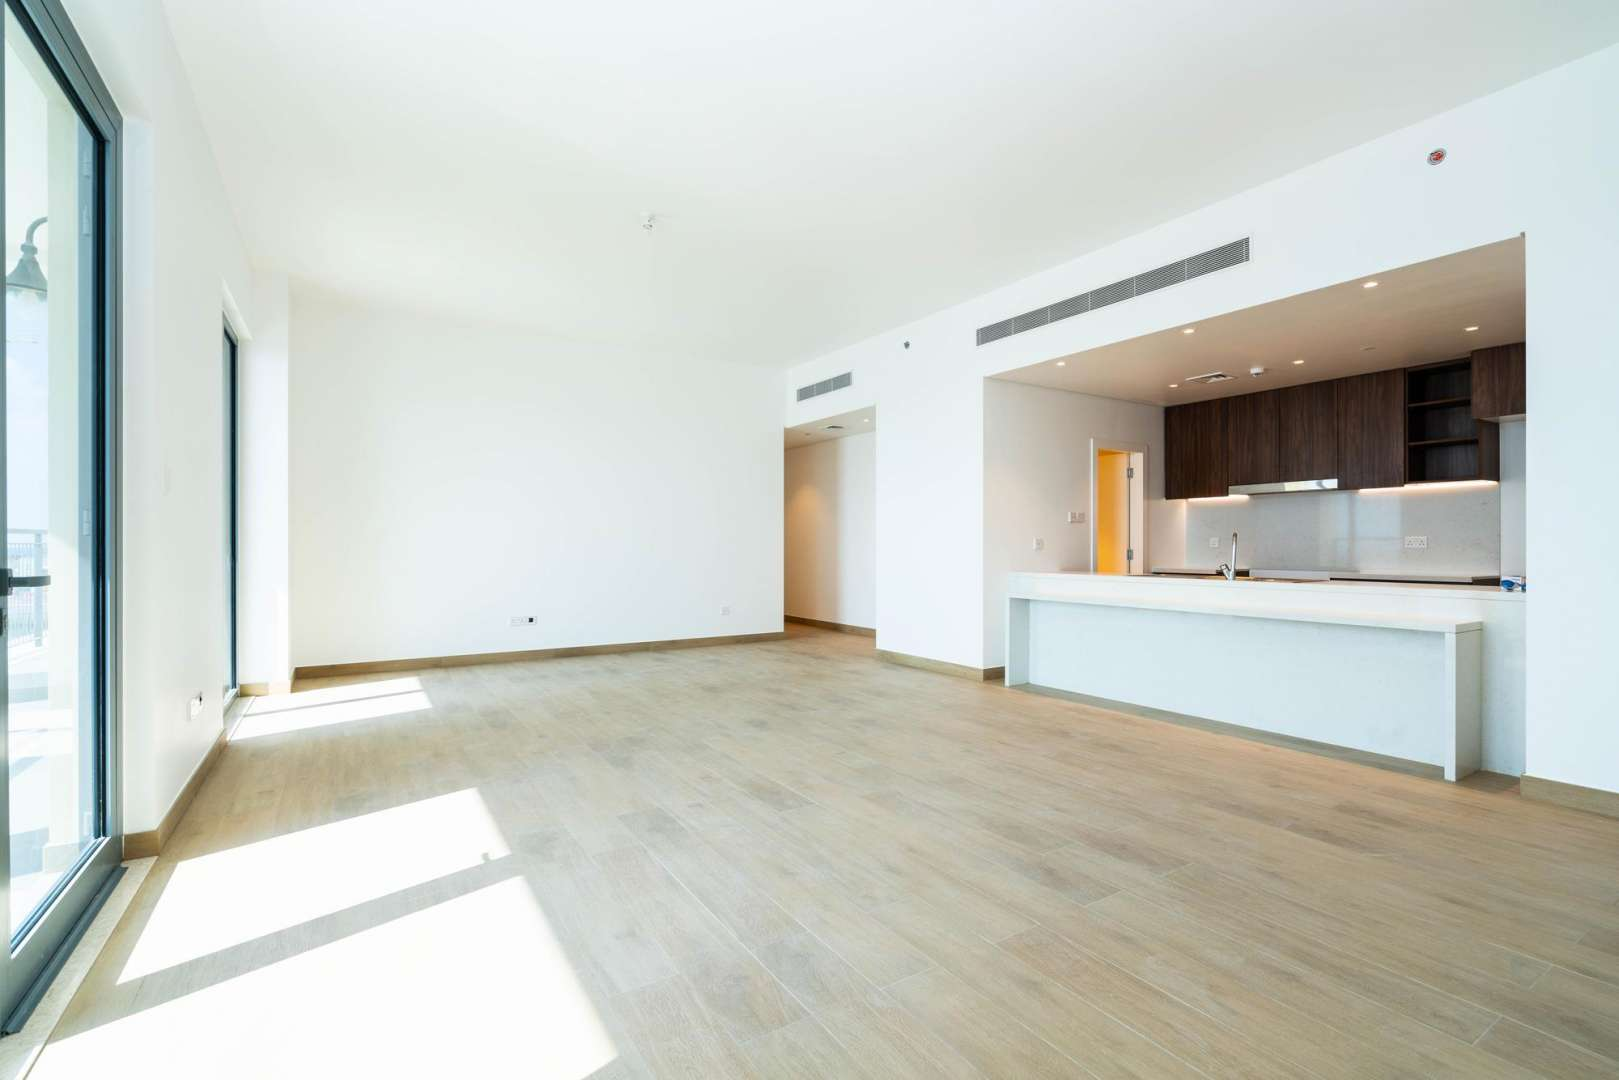 Luxury Apartments for Sale in Port de la mer, Dubai